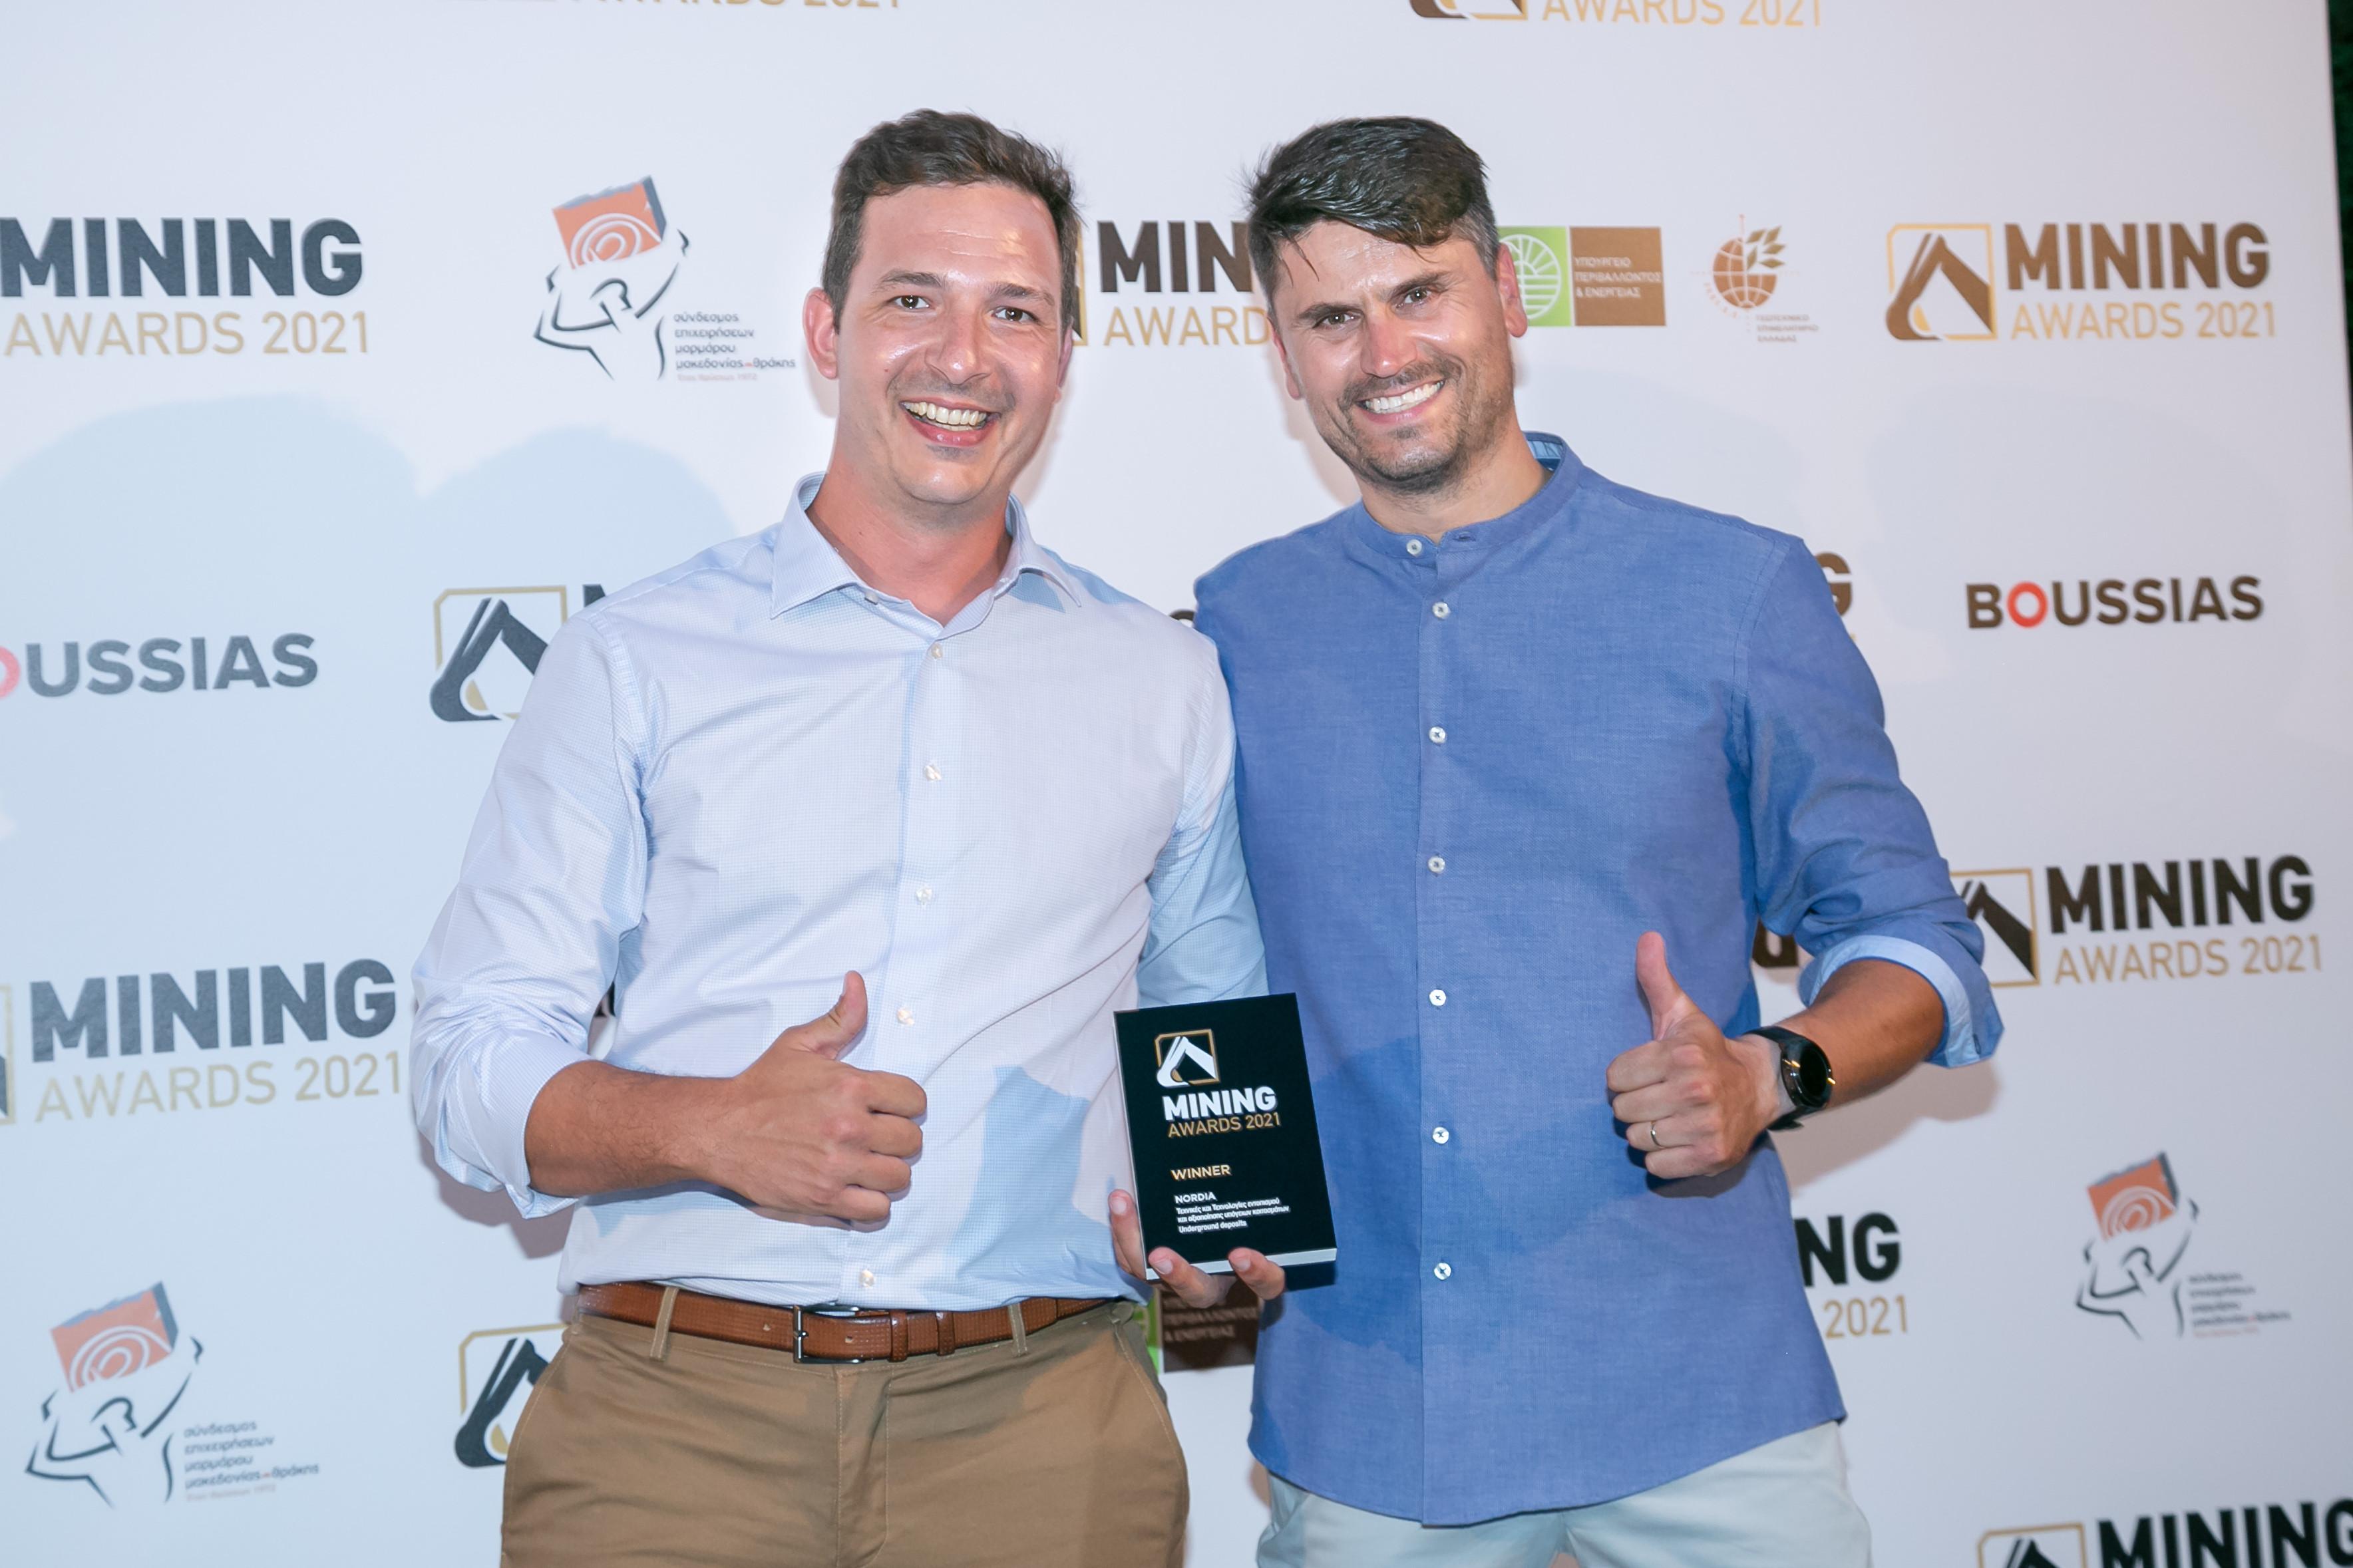 Nordia Marble. Βig winner of the Mining Awards 2021